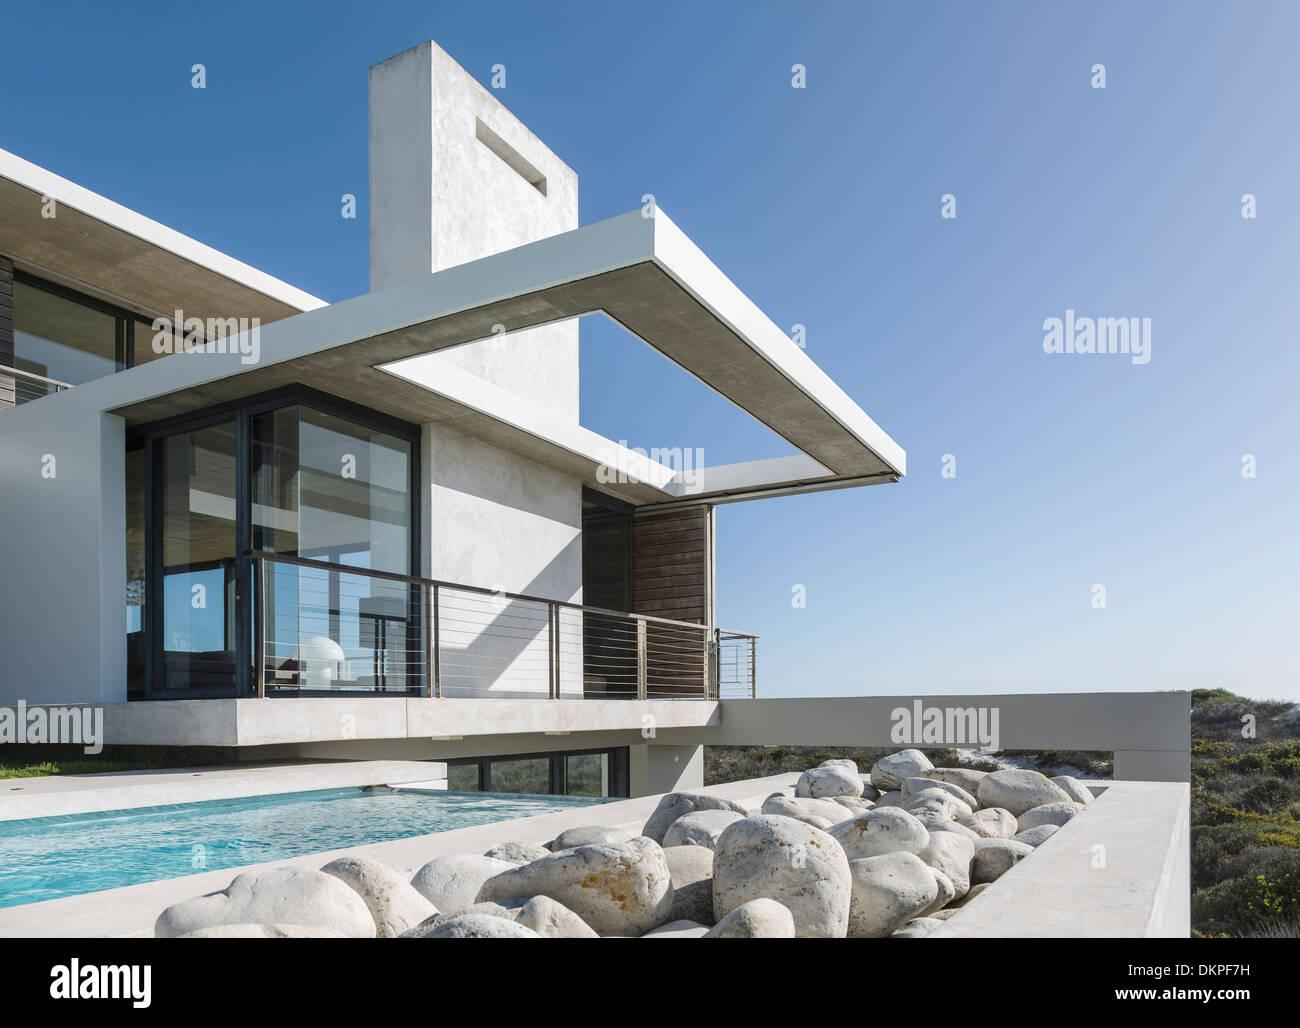 Felsen entlang Sportbecken außen modernes Haus Stockfoto, Bild ...